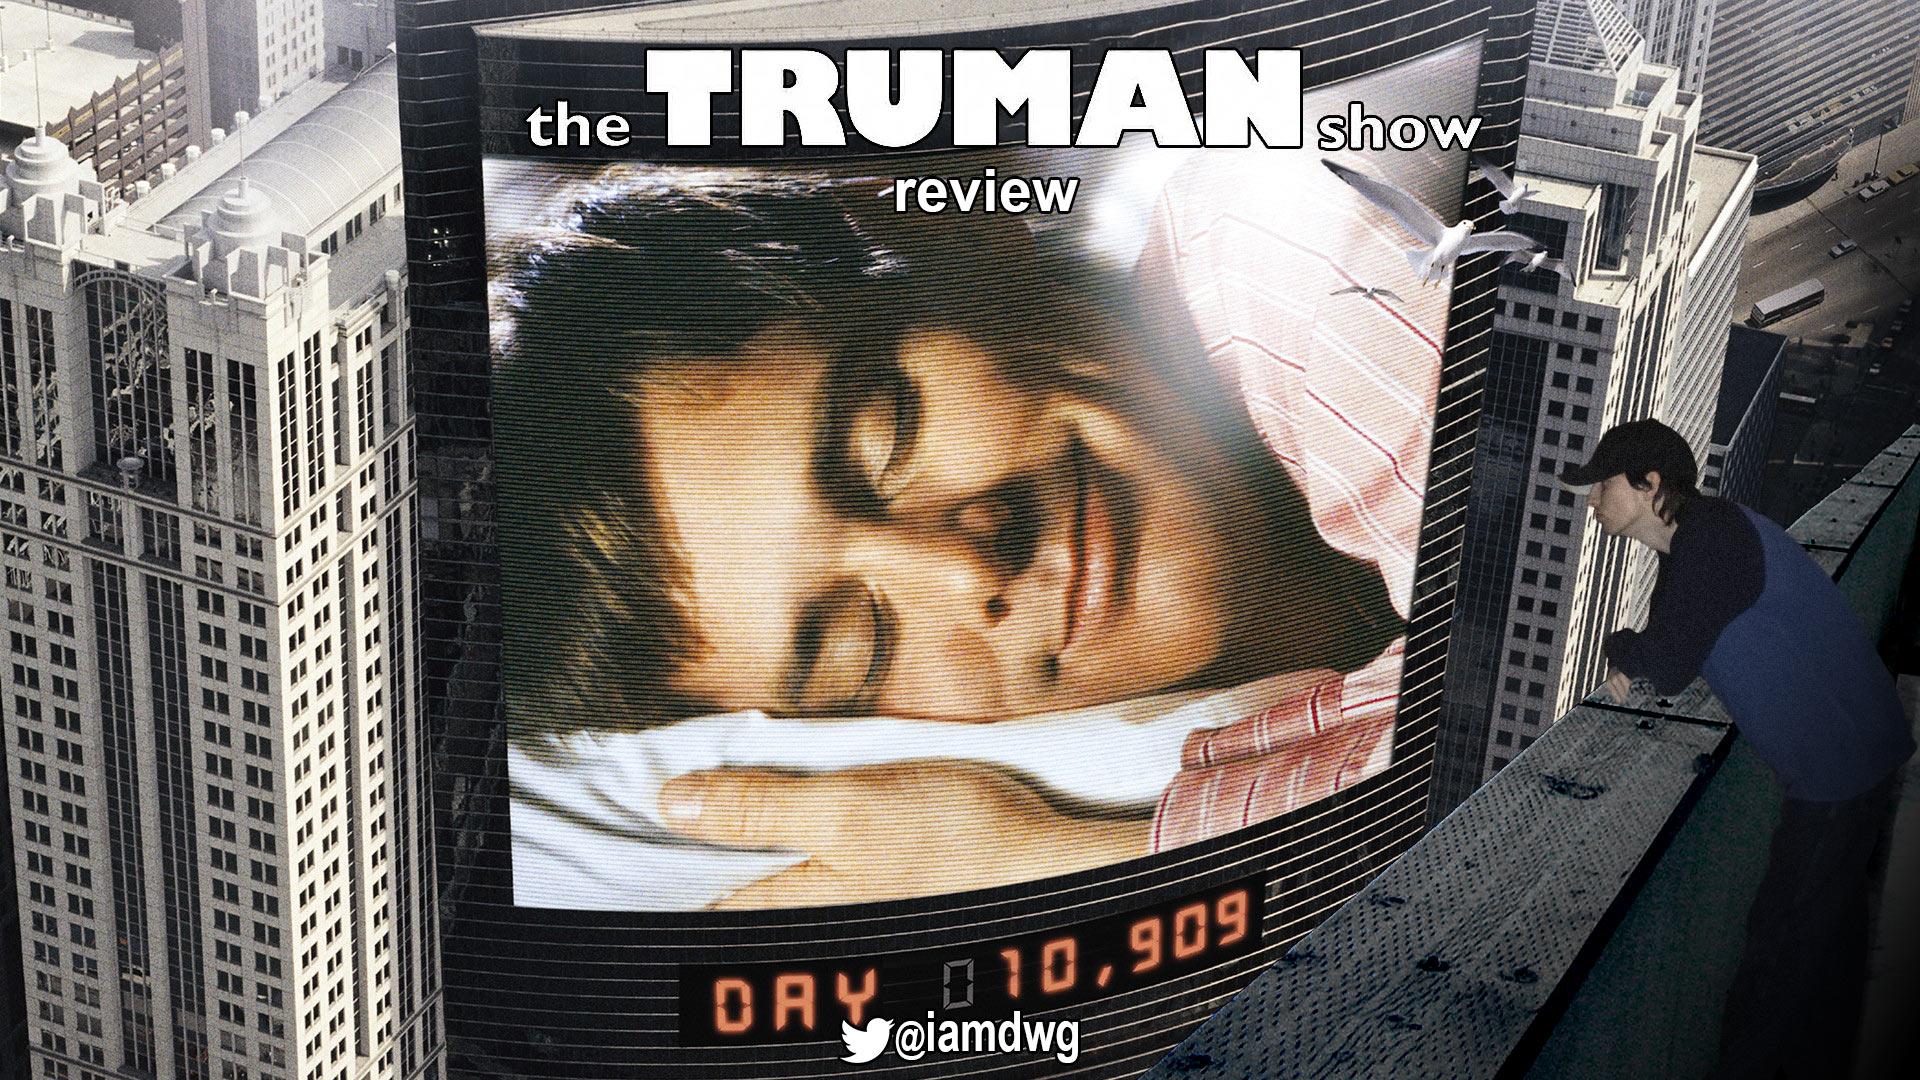 truman-show-the